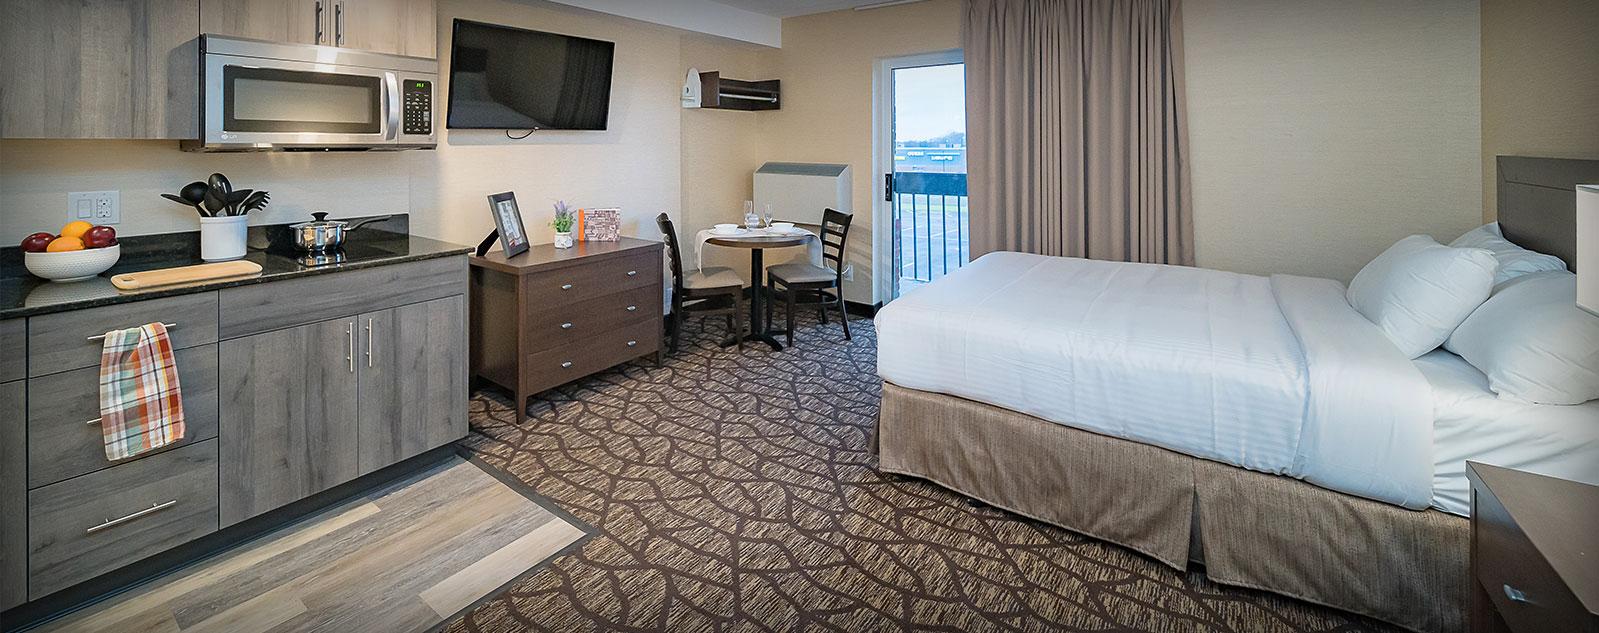 Apartments For Rent Niagara Falls Ontario Niagara Falls Inn